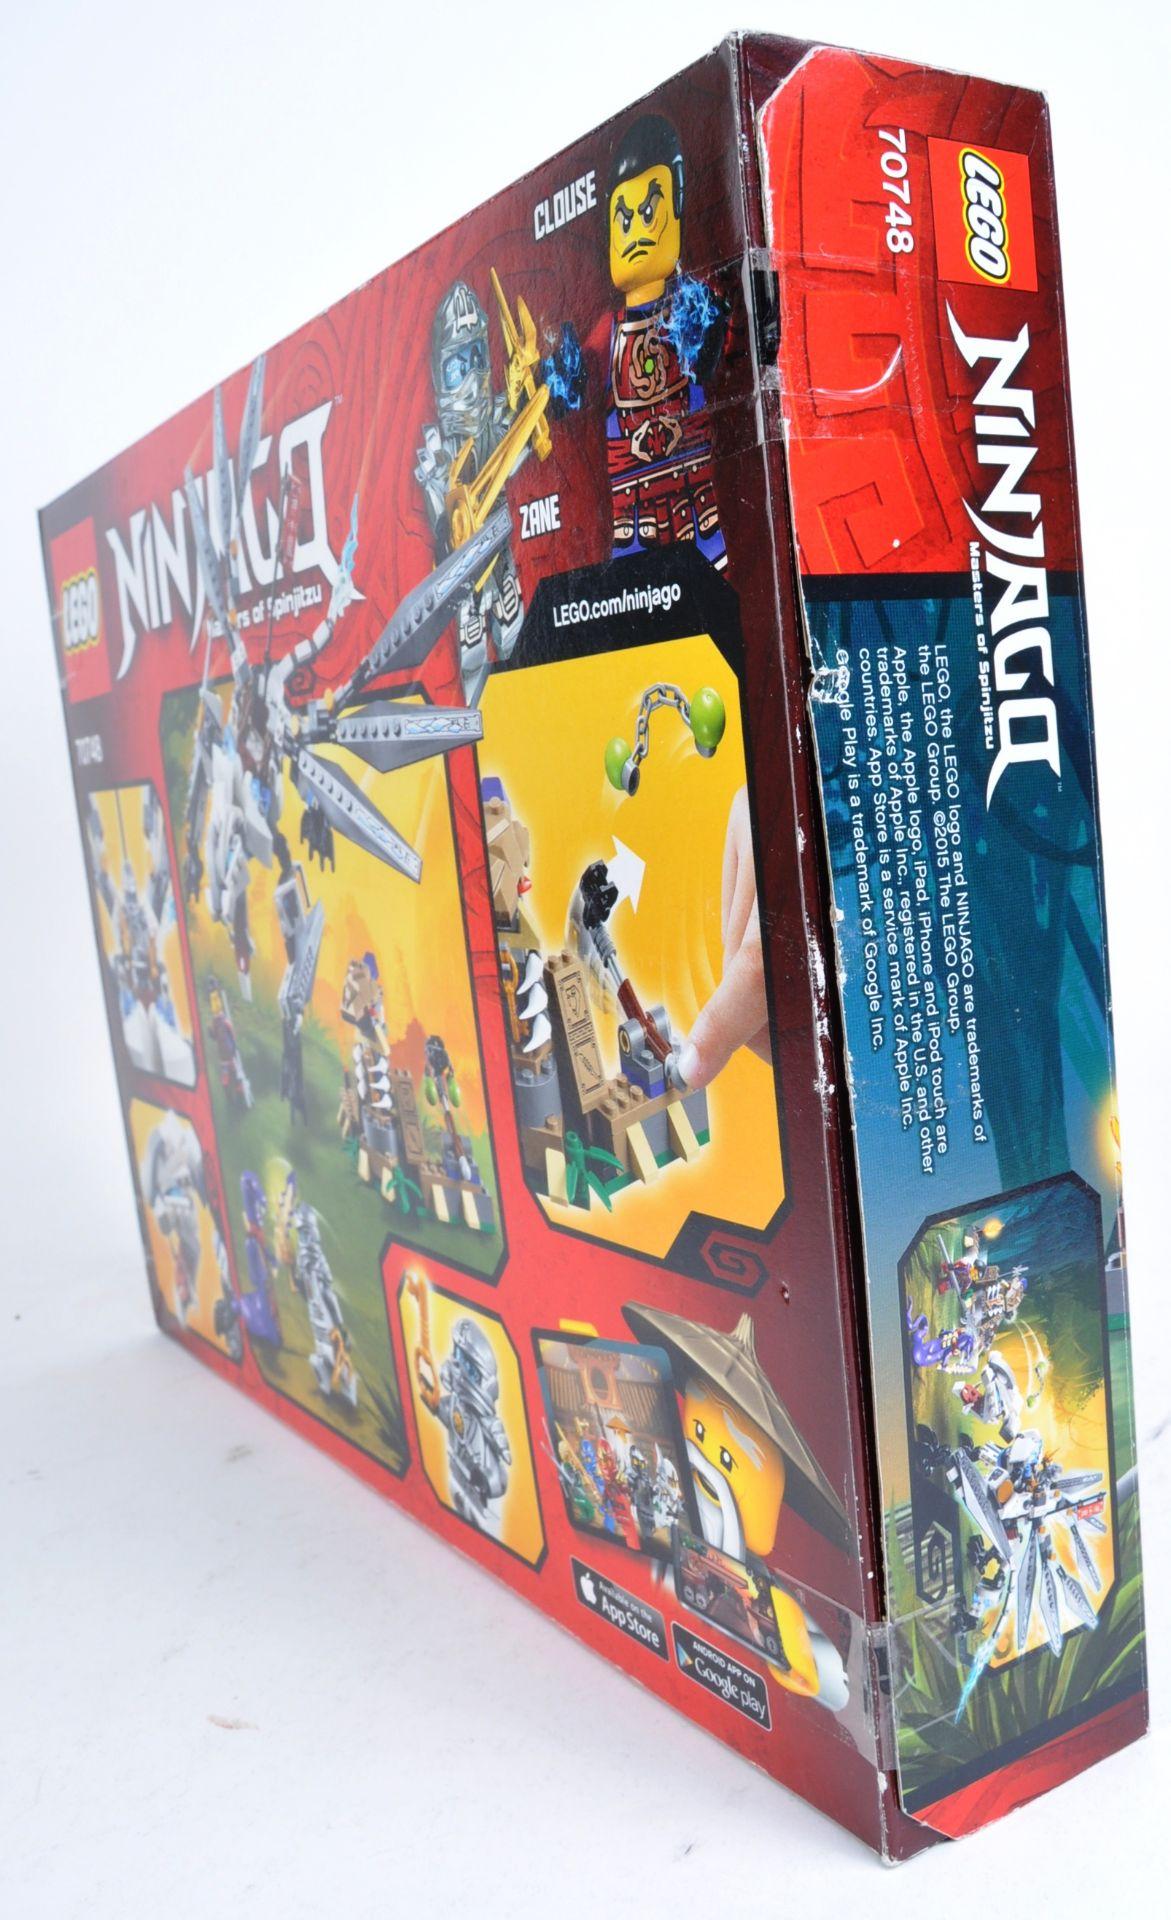 LEGO SETS - LEGO NINJAGO - 70589 / 70592 / 70746 / 70748 - Image 7 of 10